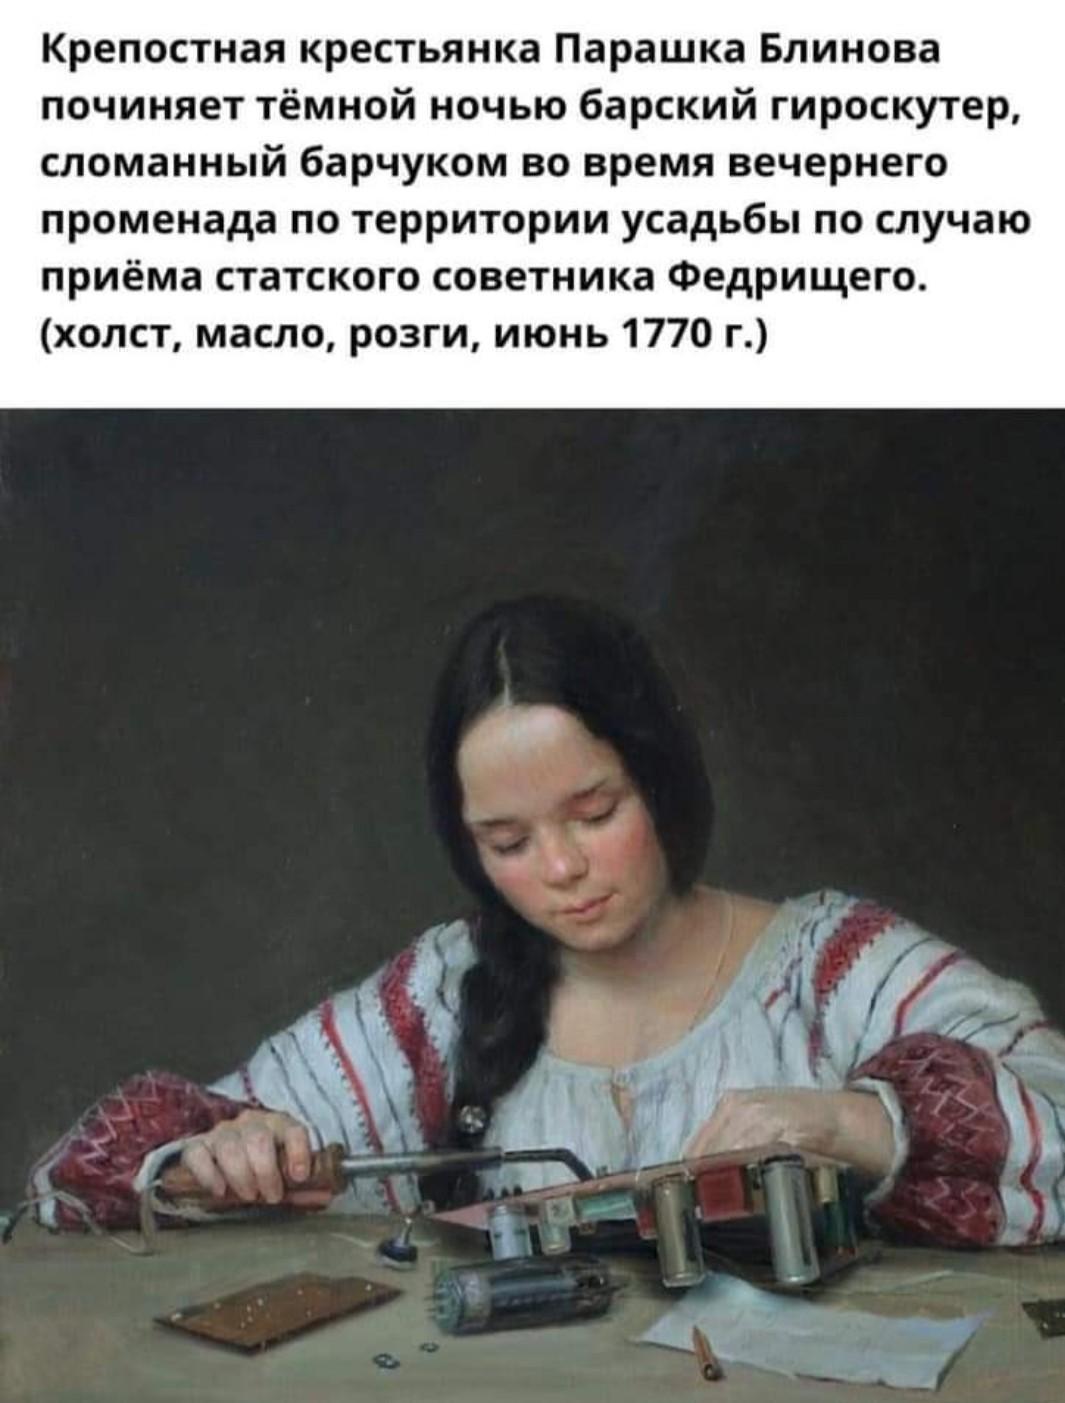 https://s00.yaplakal.com/pics/pics_original/1/3/1/14816131.jpg